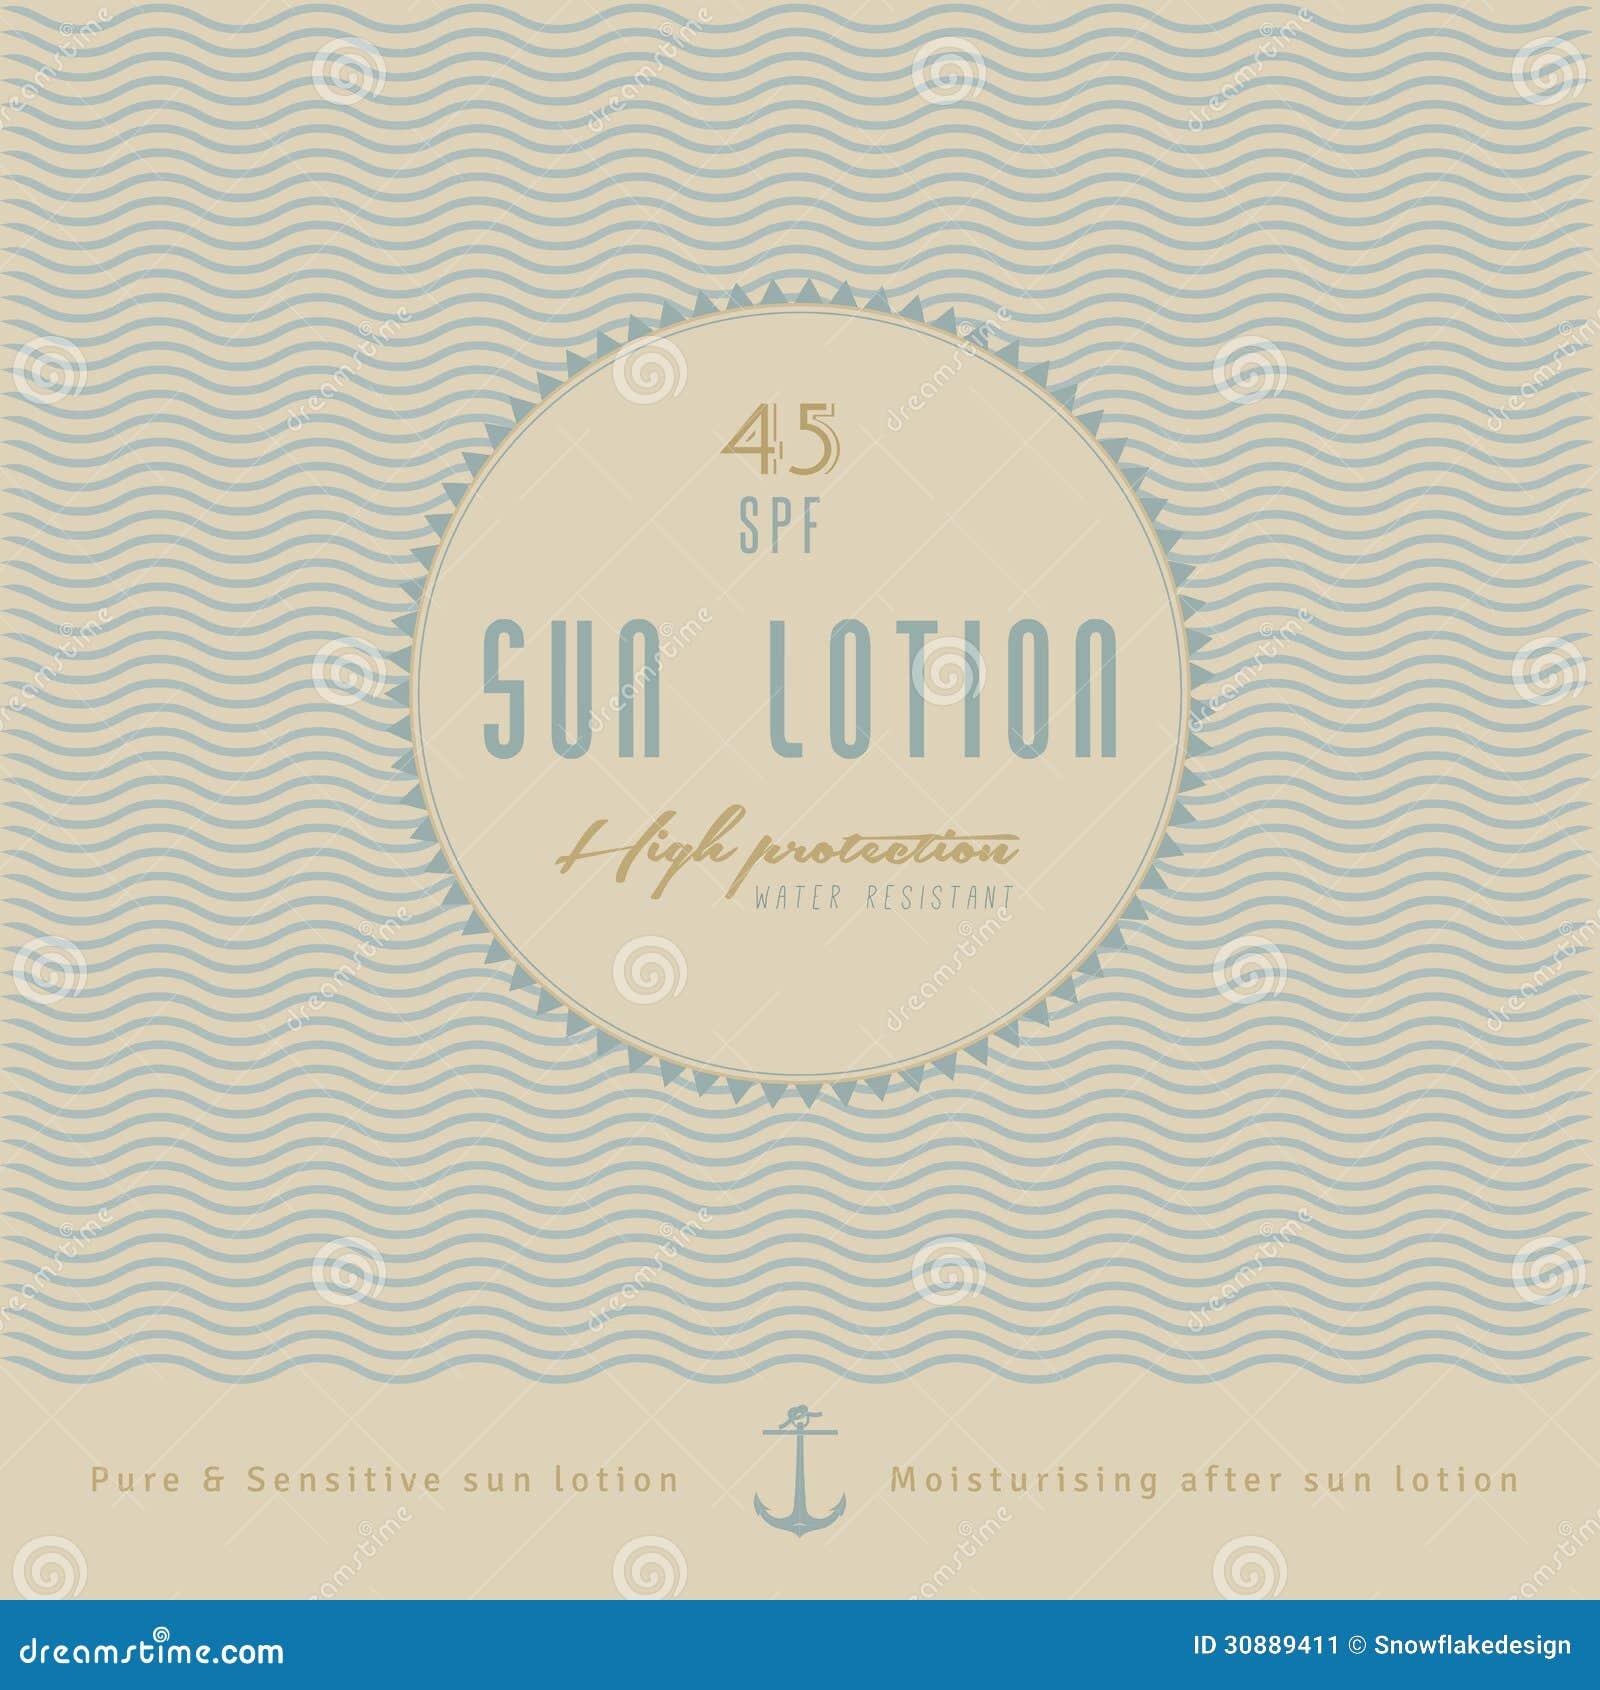 Ретро дизайн ярлыка лосьона Солнця/ретро, винтажный хлев